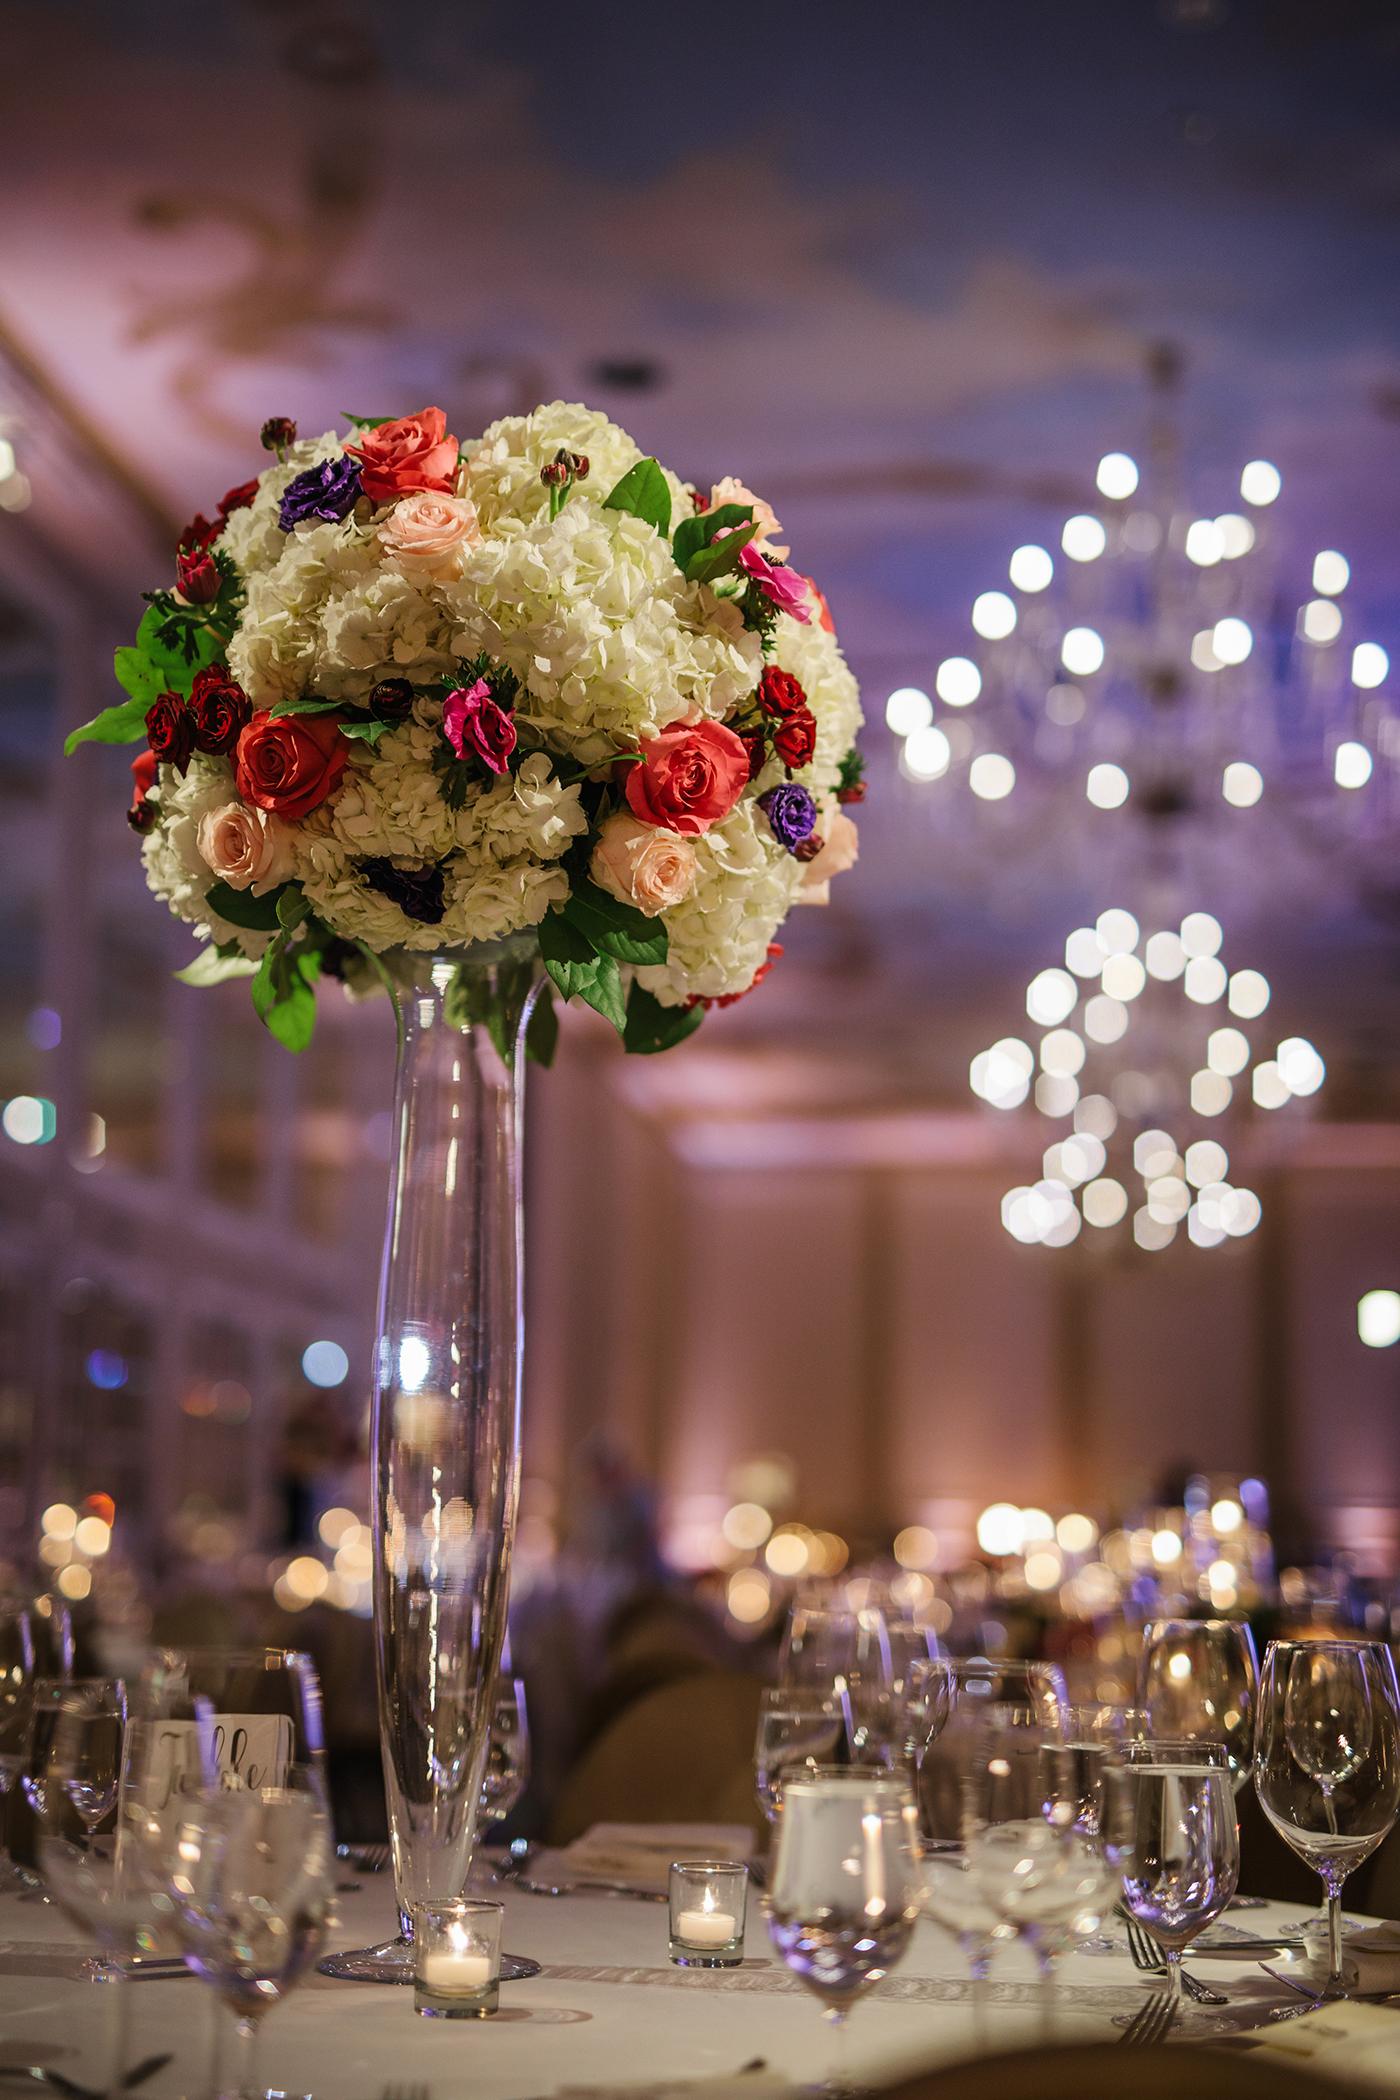 Dallas Weddings Planner - Allday Events - Katie + Matthew at The Adolphus Hotel - 521.jpg